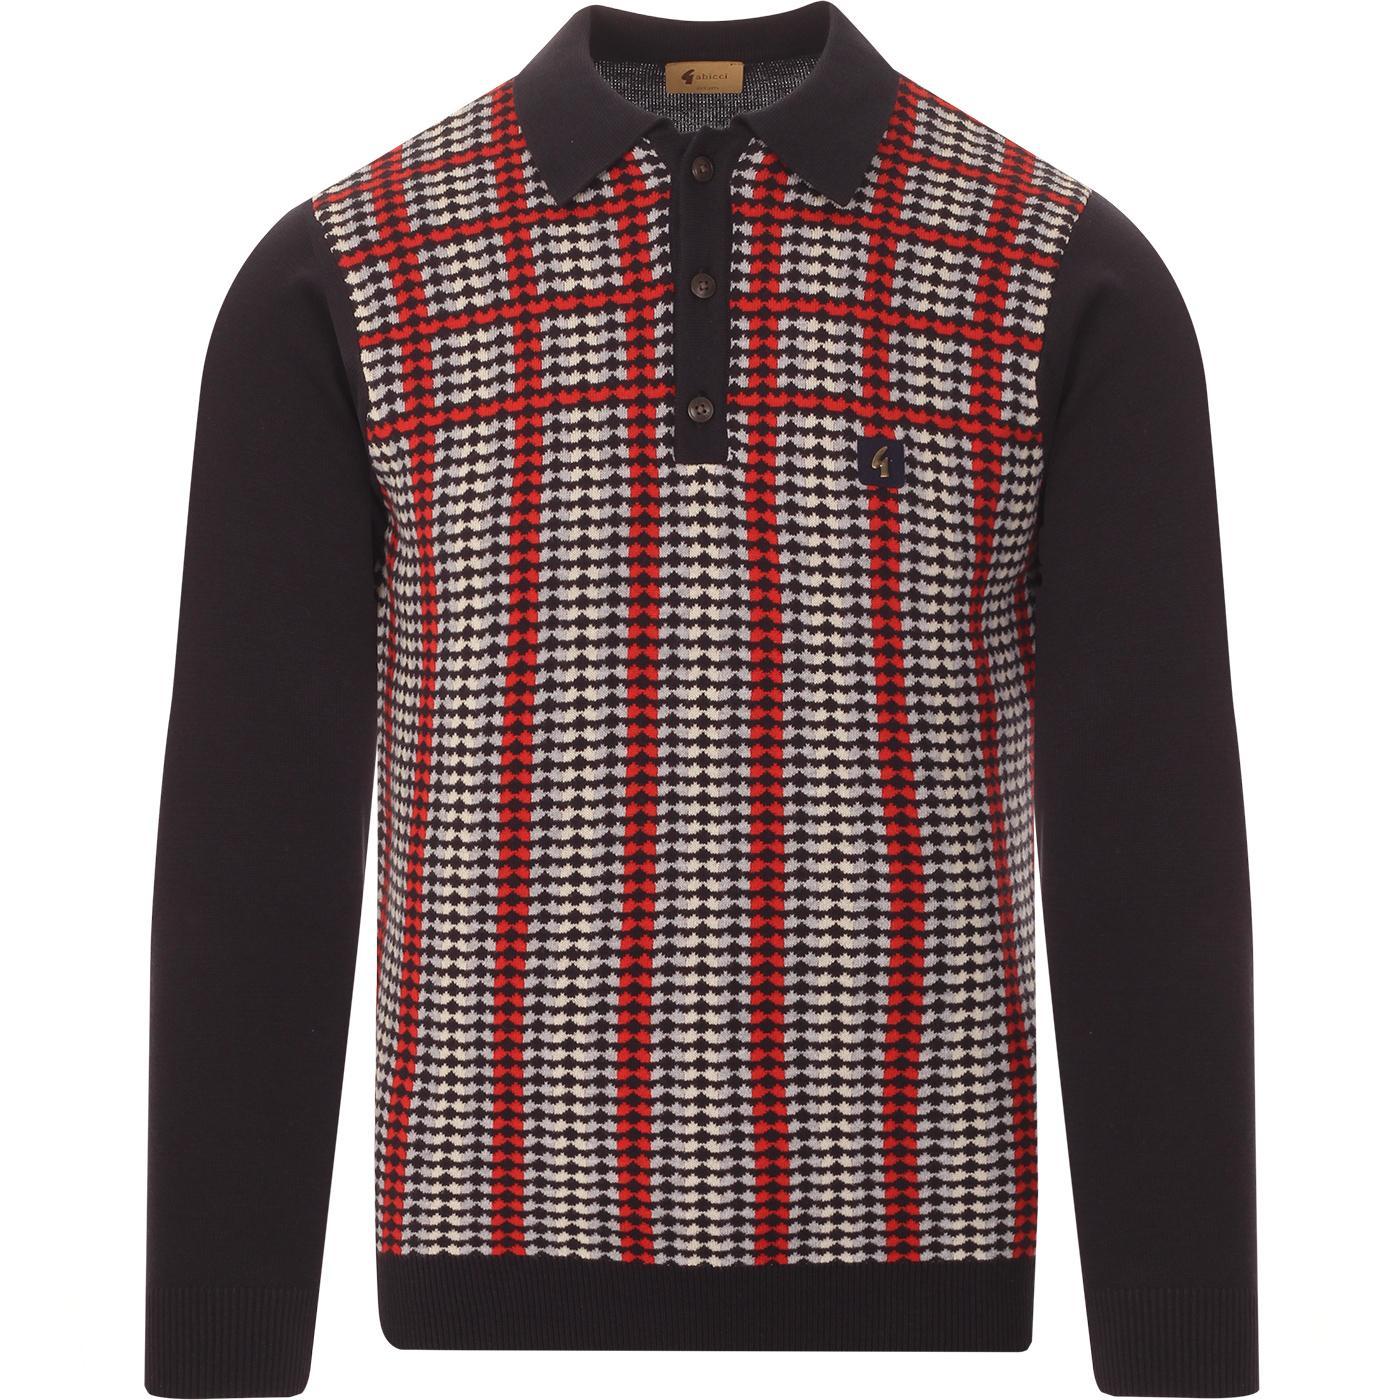 Willis GABICCI VINTAGE Retro 70s Knitted Polo - N